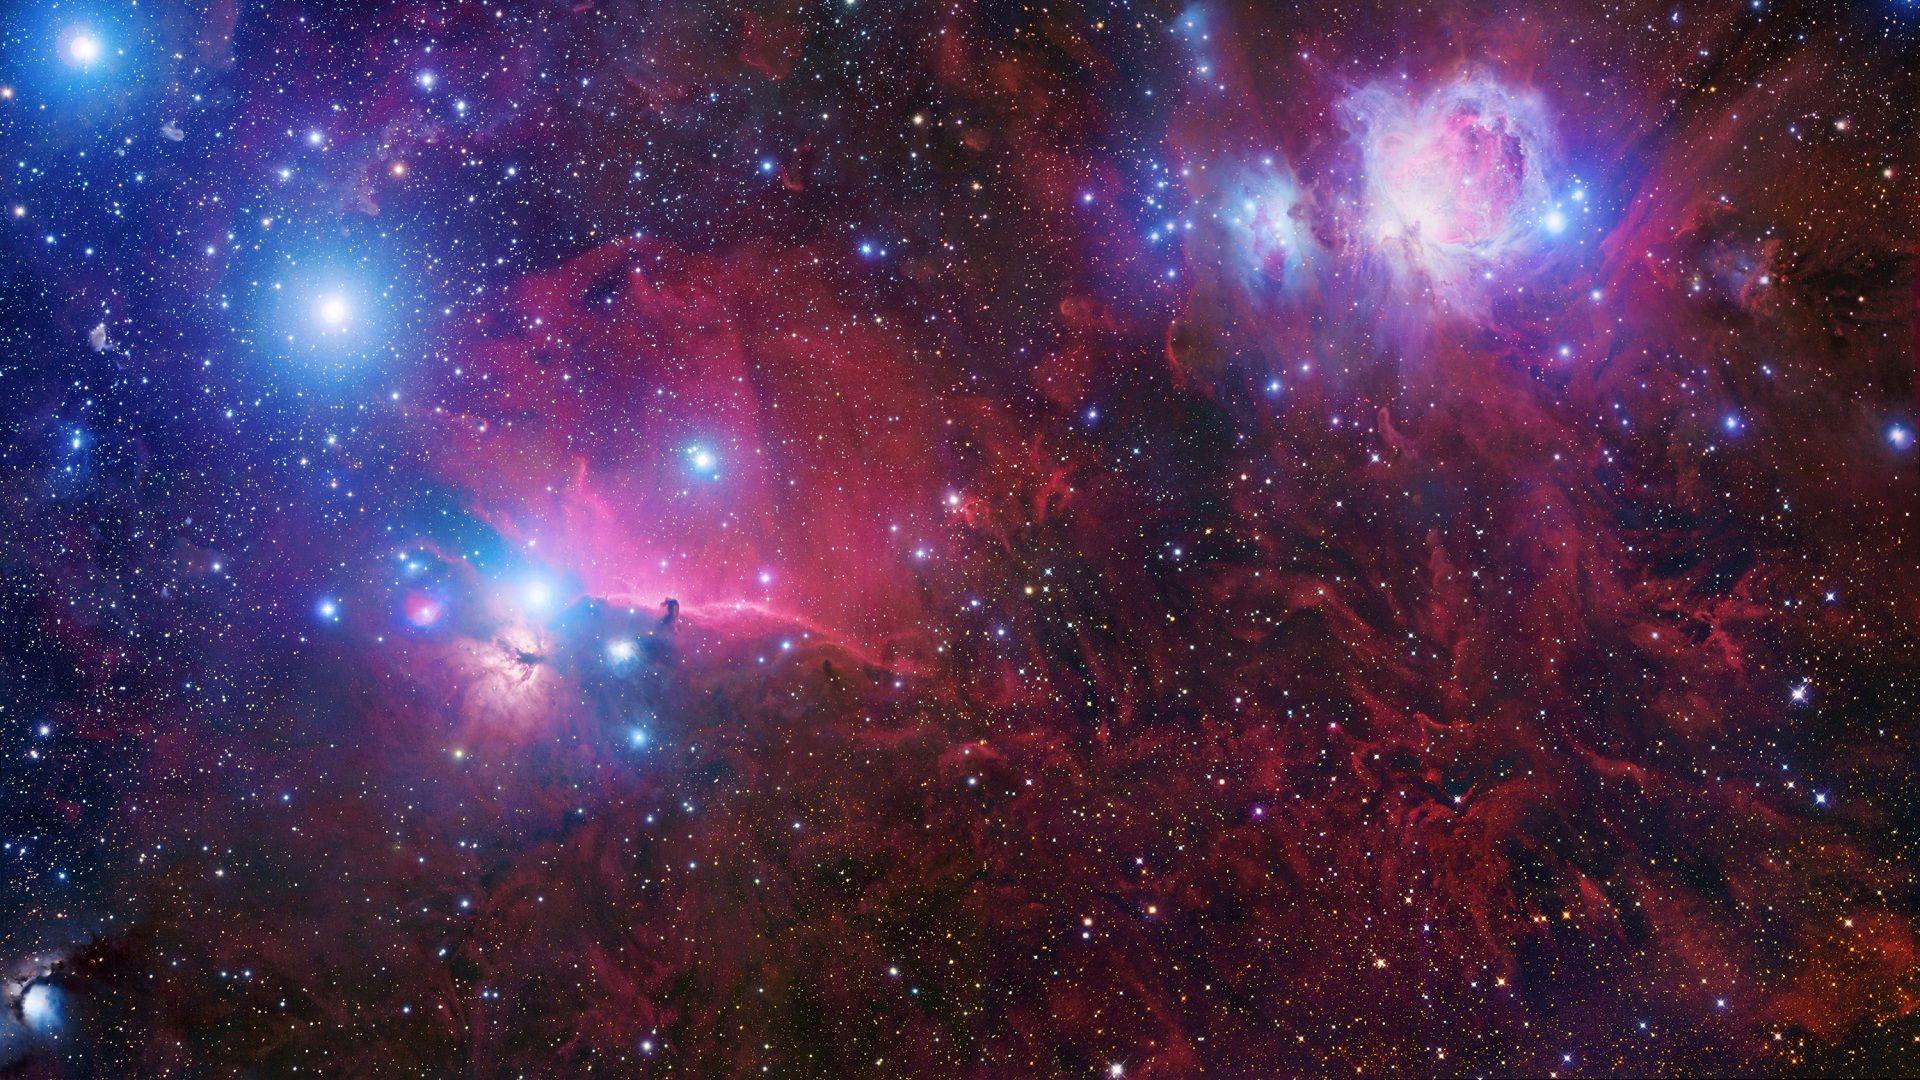 Orion 1920x1080 Hd Galaxy Wallpaper Galaxy Wallpaper Nebula